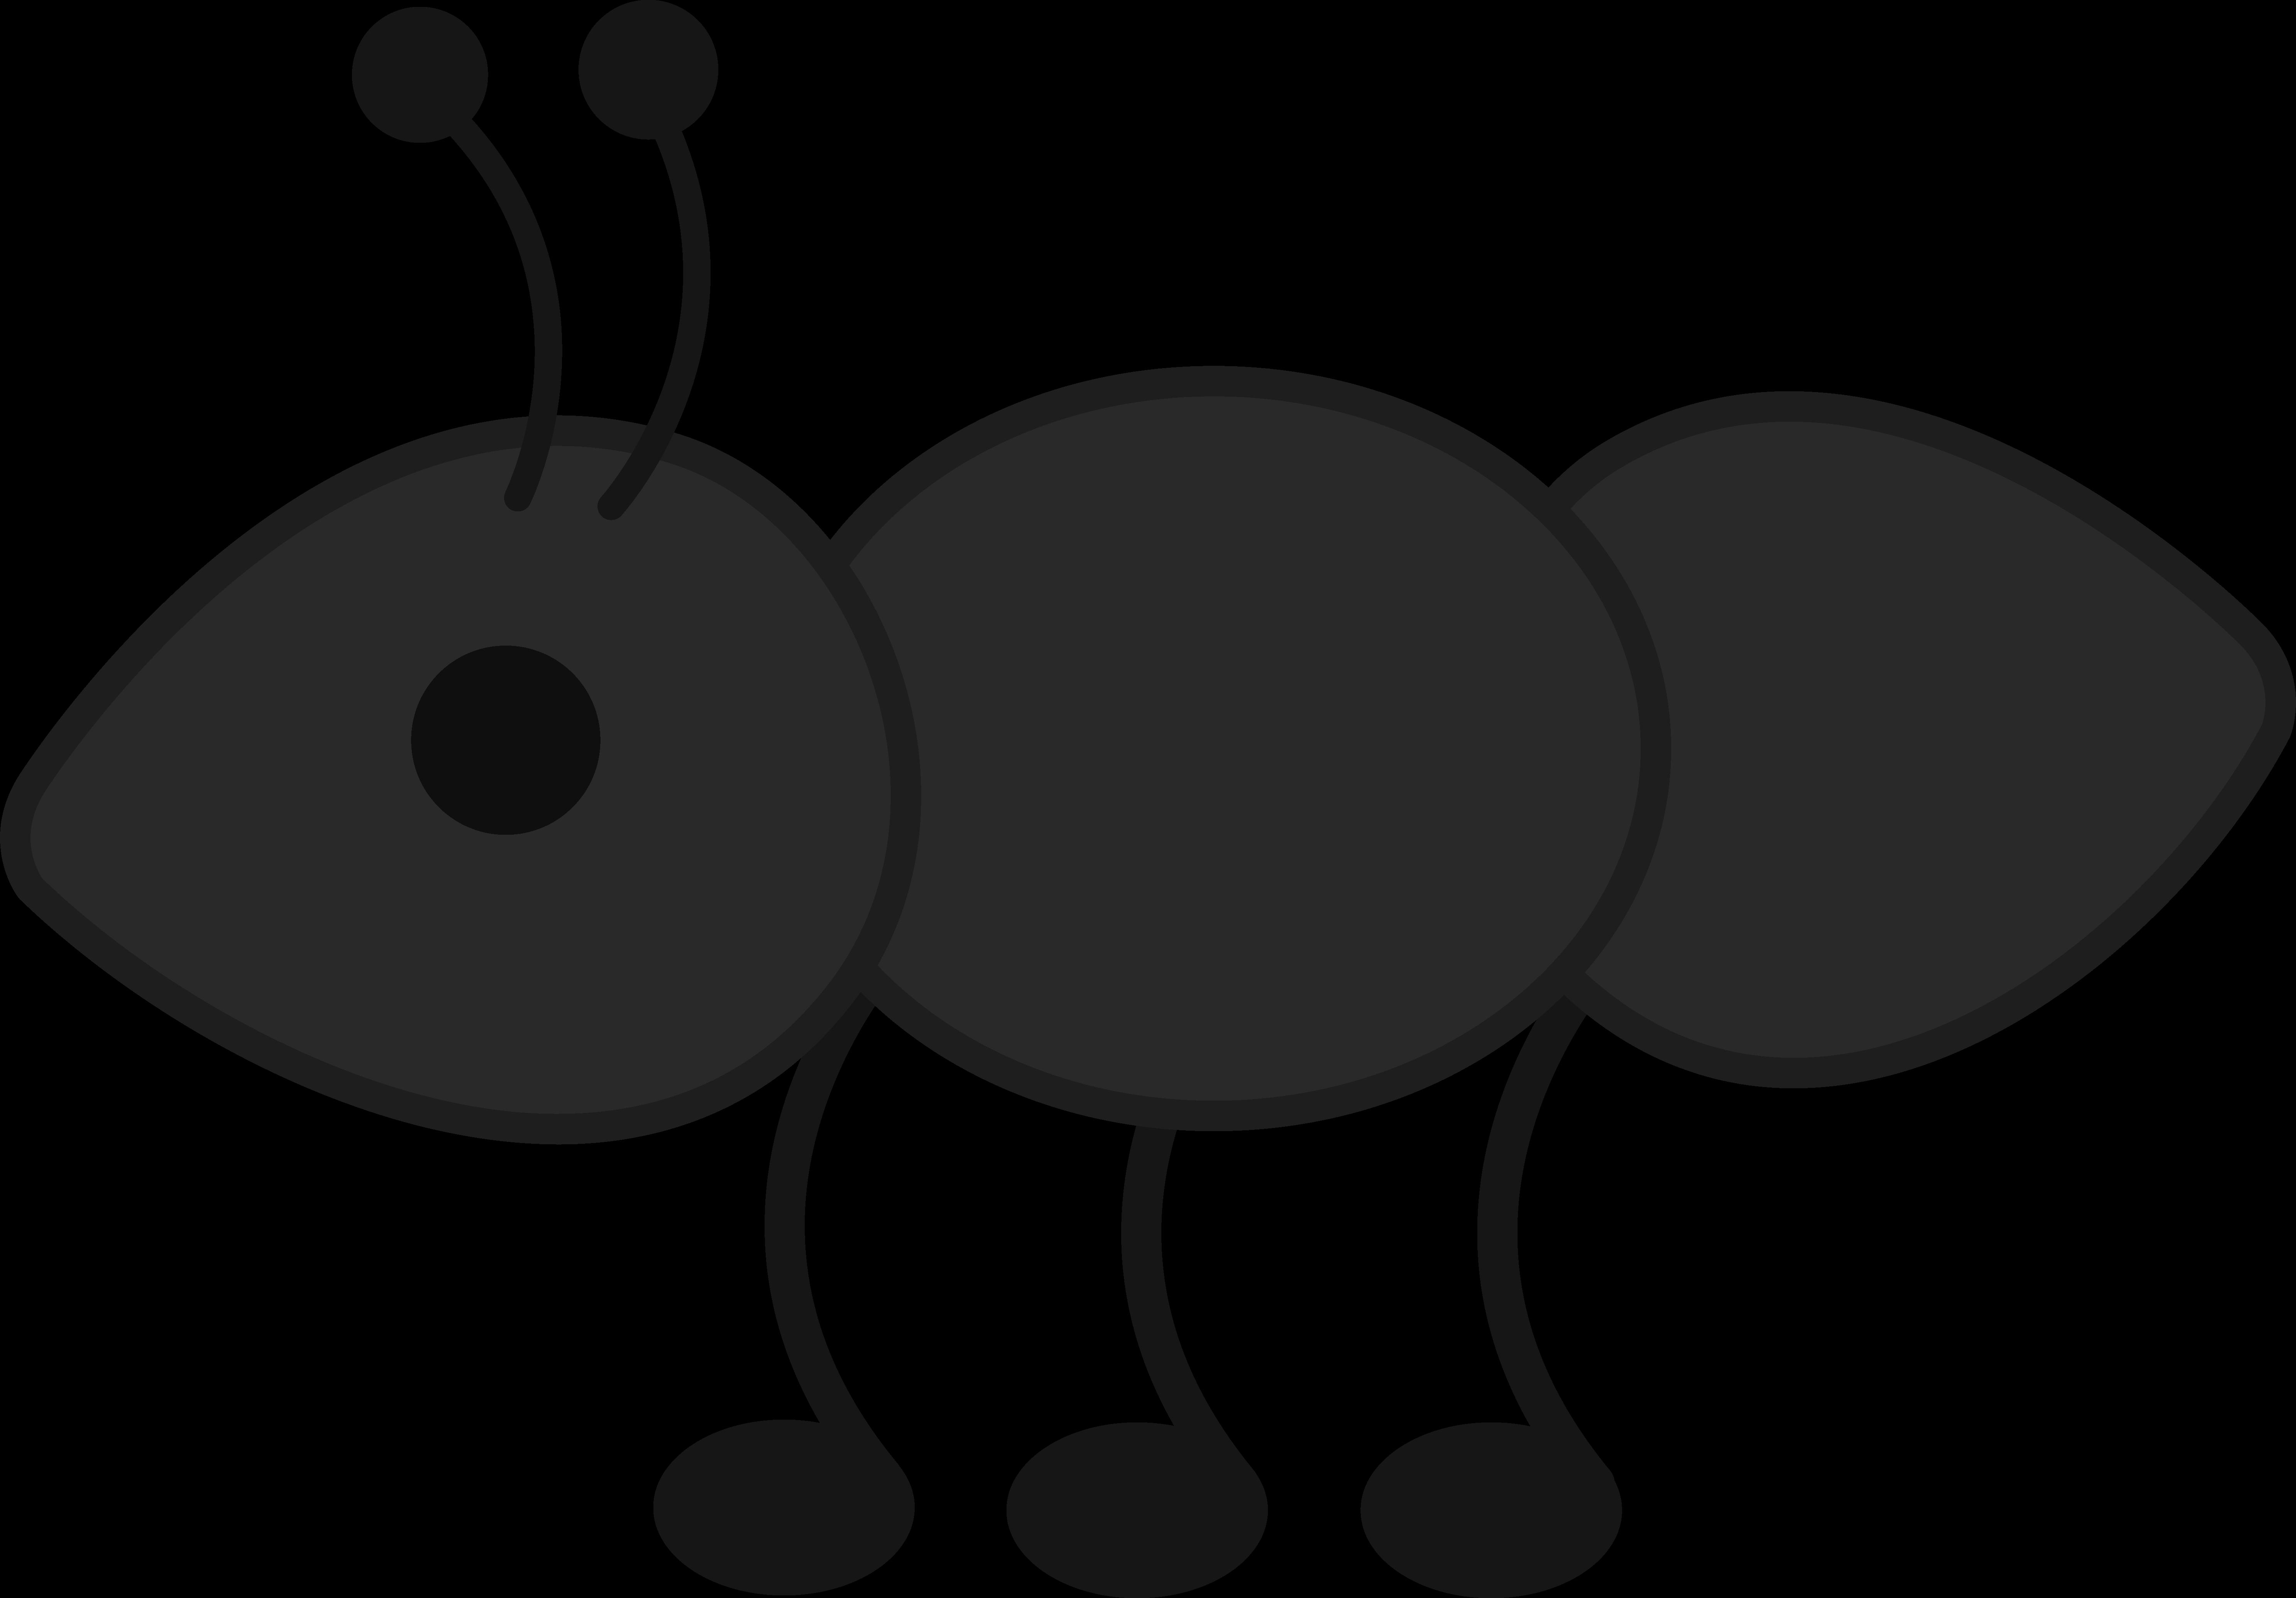 Fire ant clipartblack com. Ants clipart gray